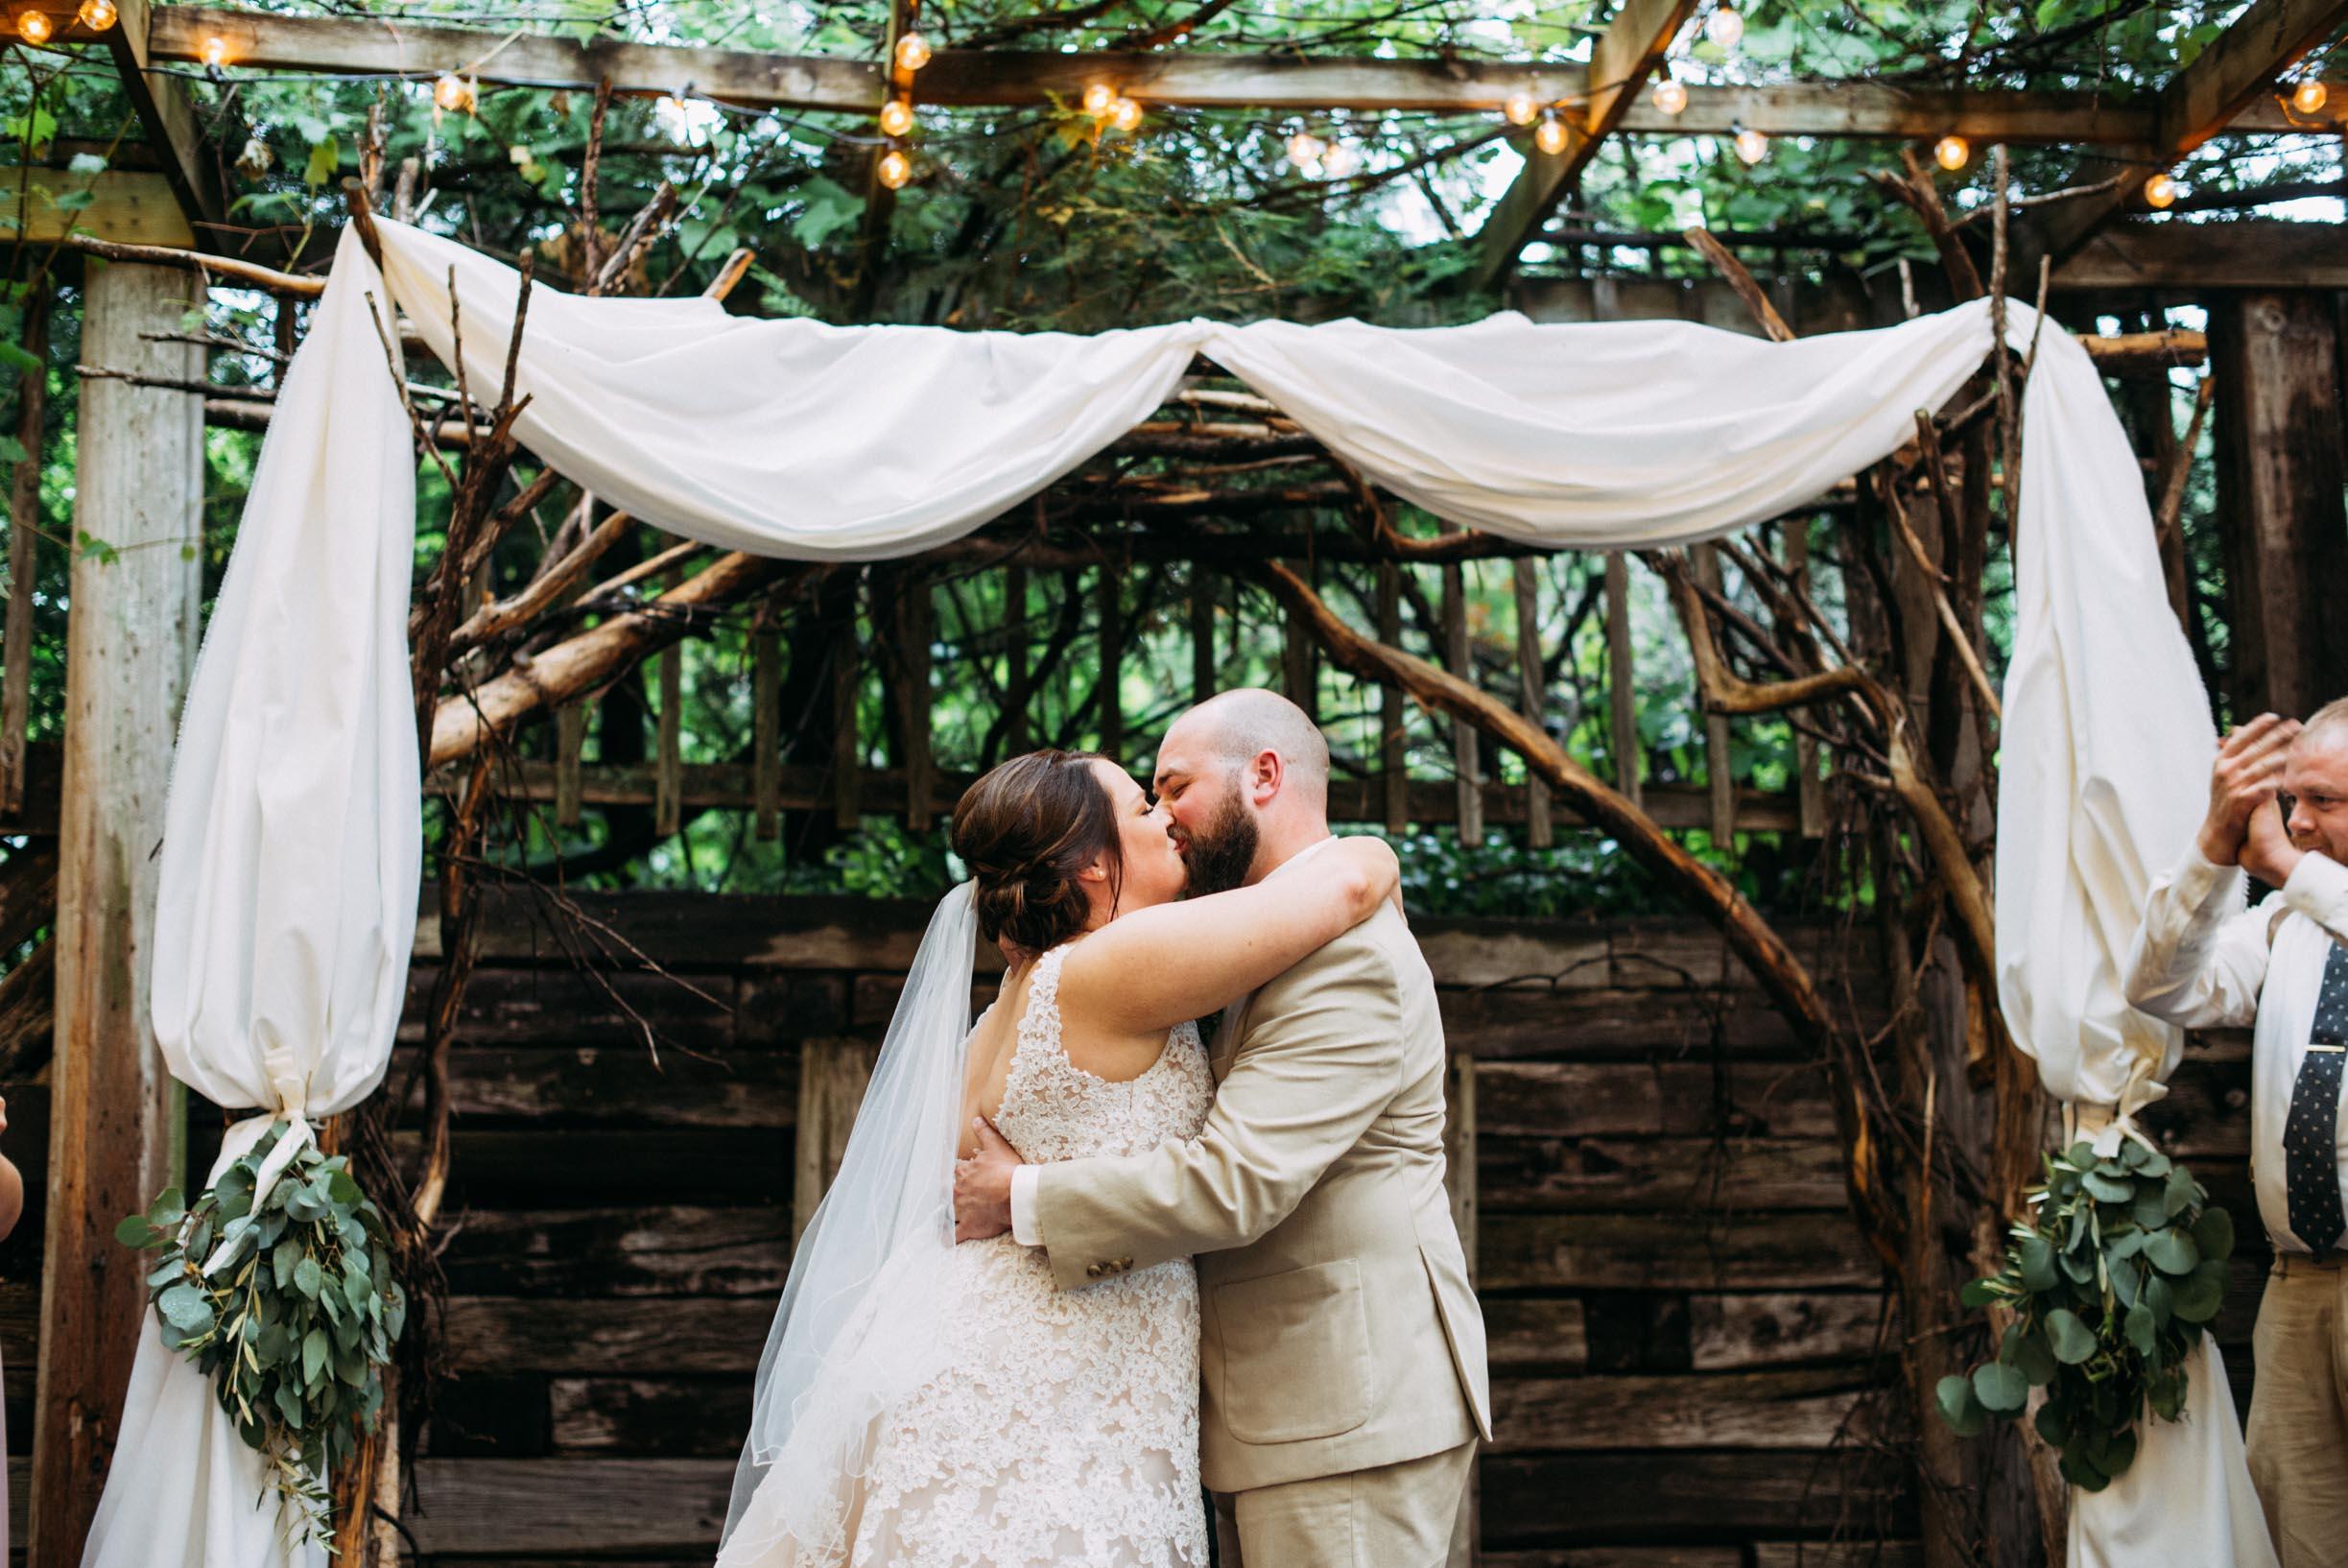 49-Jess_Jeremy_Minnesota_Wedding_Ceremony.jpg